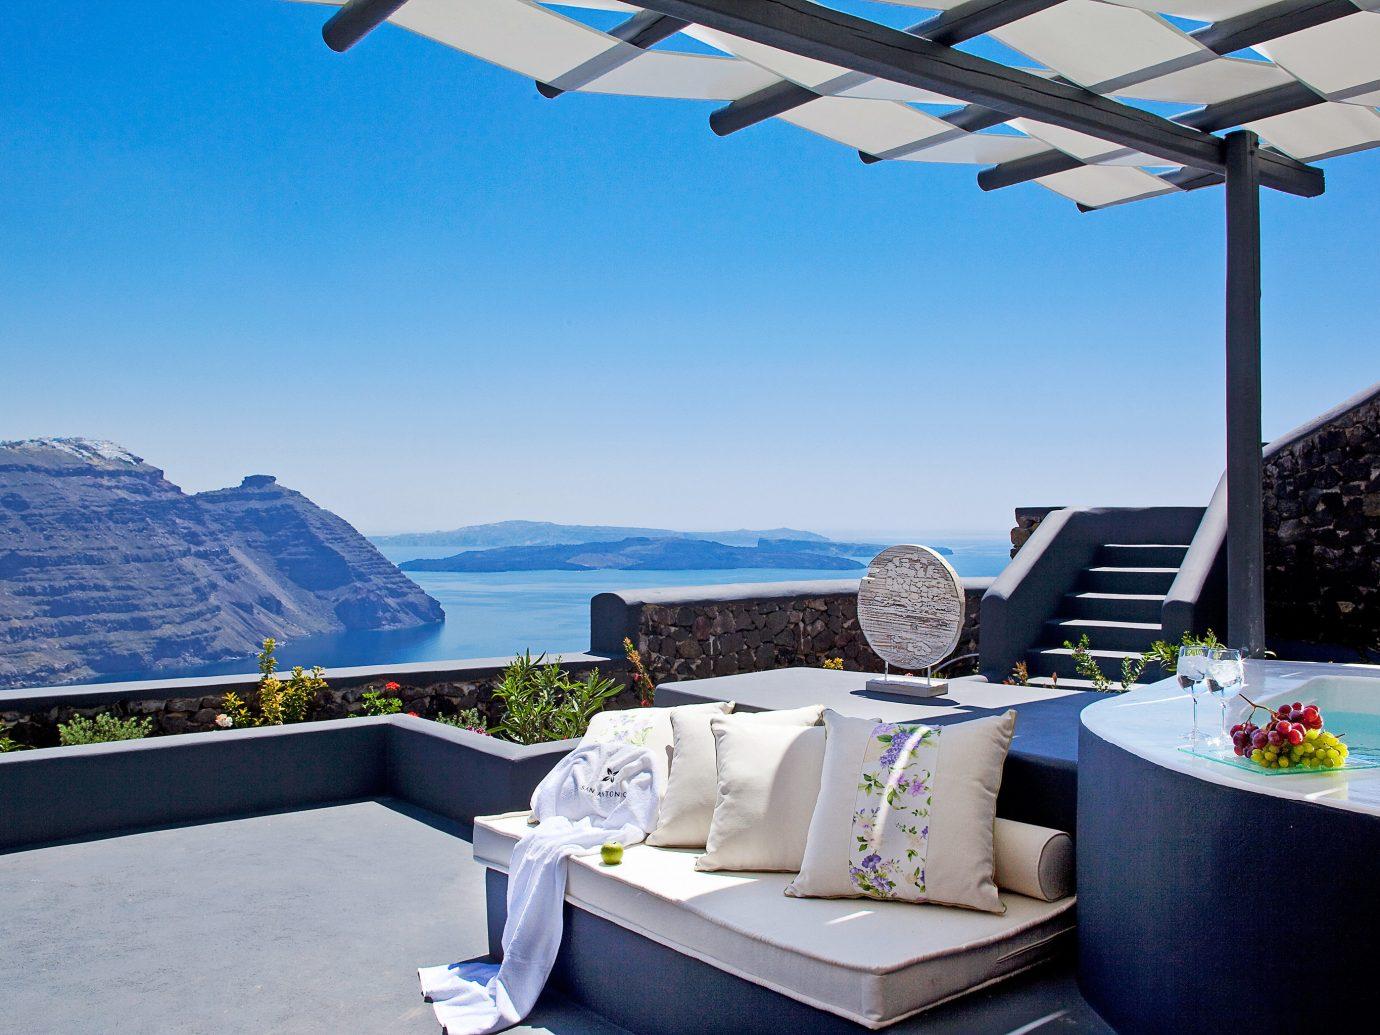 Beachfront Greece Hotels Living Lounge Luxury Santorini sky outdoor blue swimming pool property vacation estate Villa vehicle yacht cottage Resort passenger ship apartment